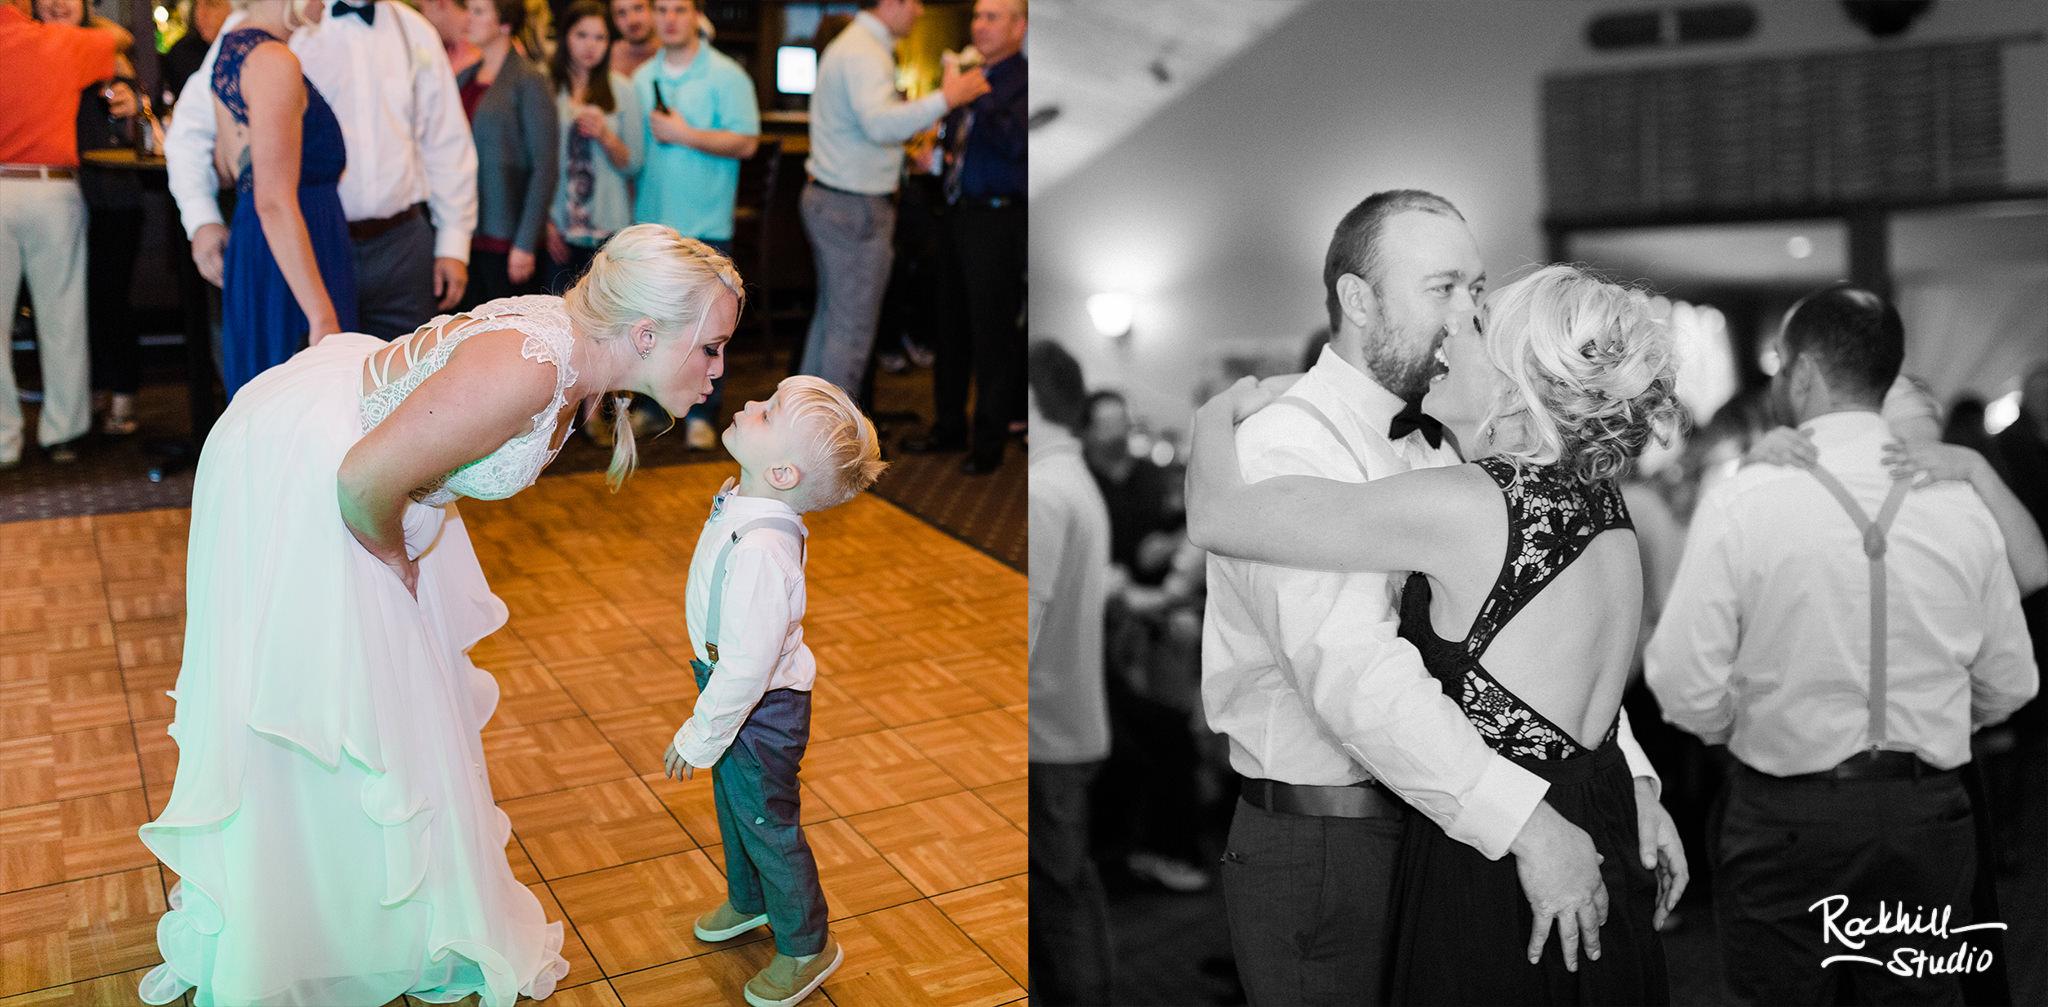 Traverse City Wedding Photographer, bride and groom northern michigan, Rockhill Studio